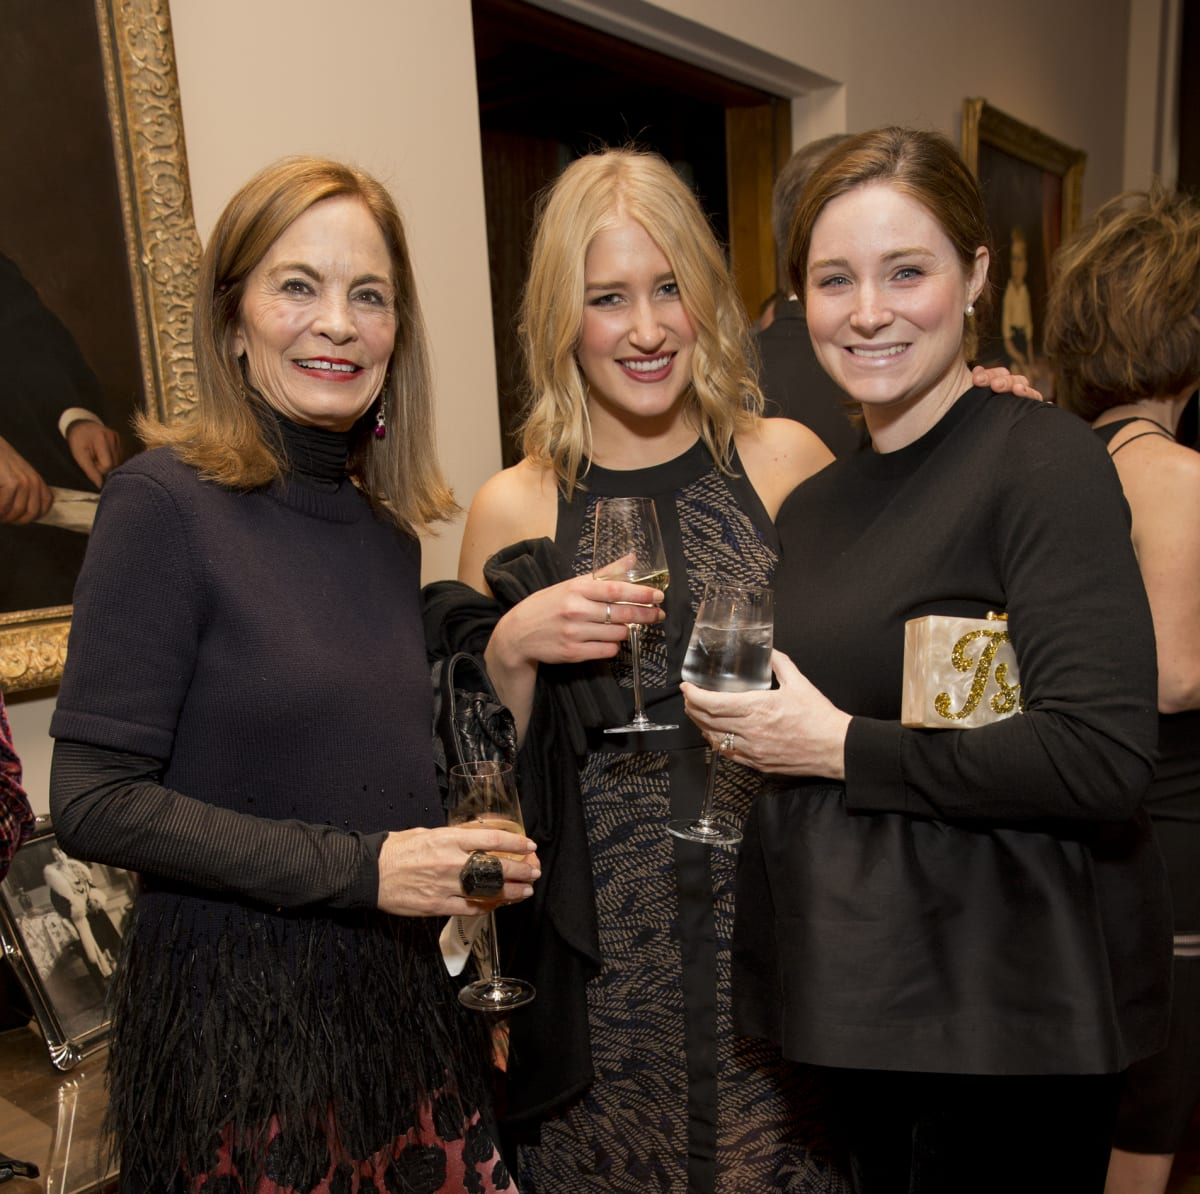 Rienzi society dinner, Feb. 2016, Cindy Thorp; Ann Wolpert; Isla Jornayvaz